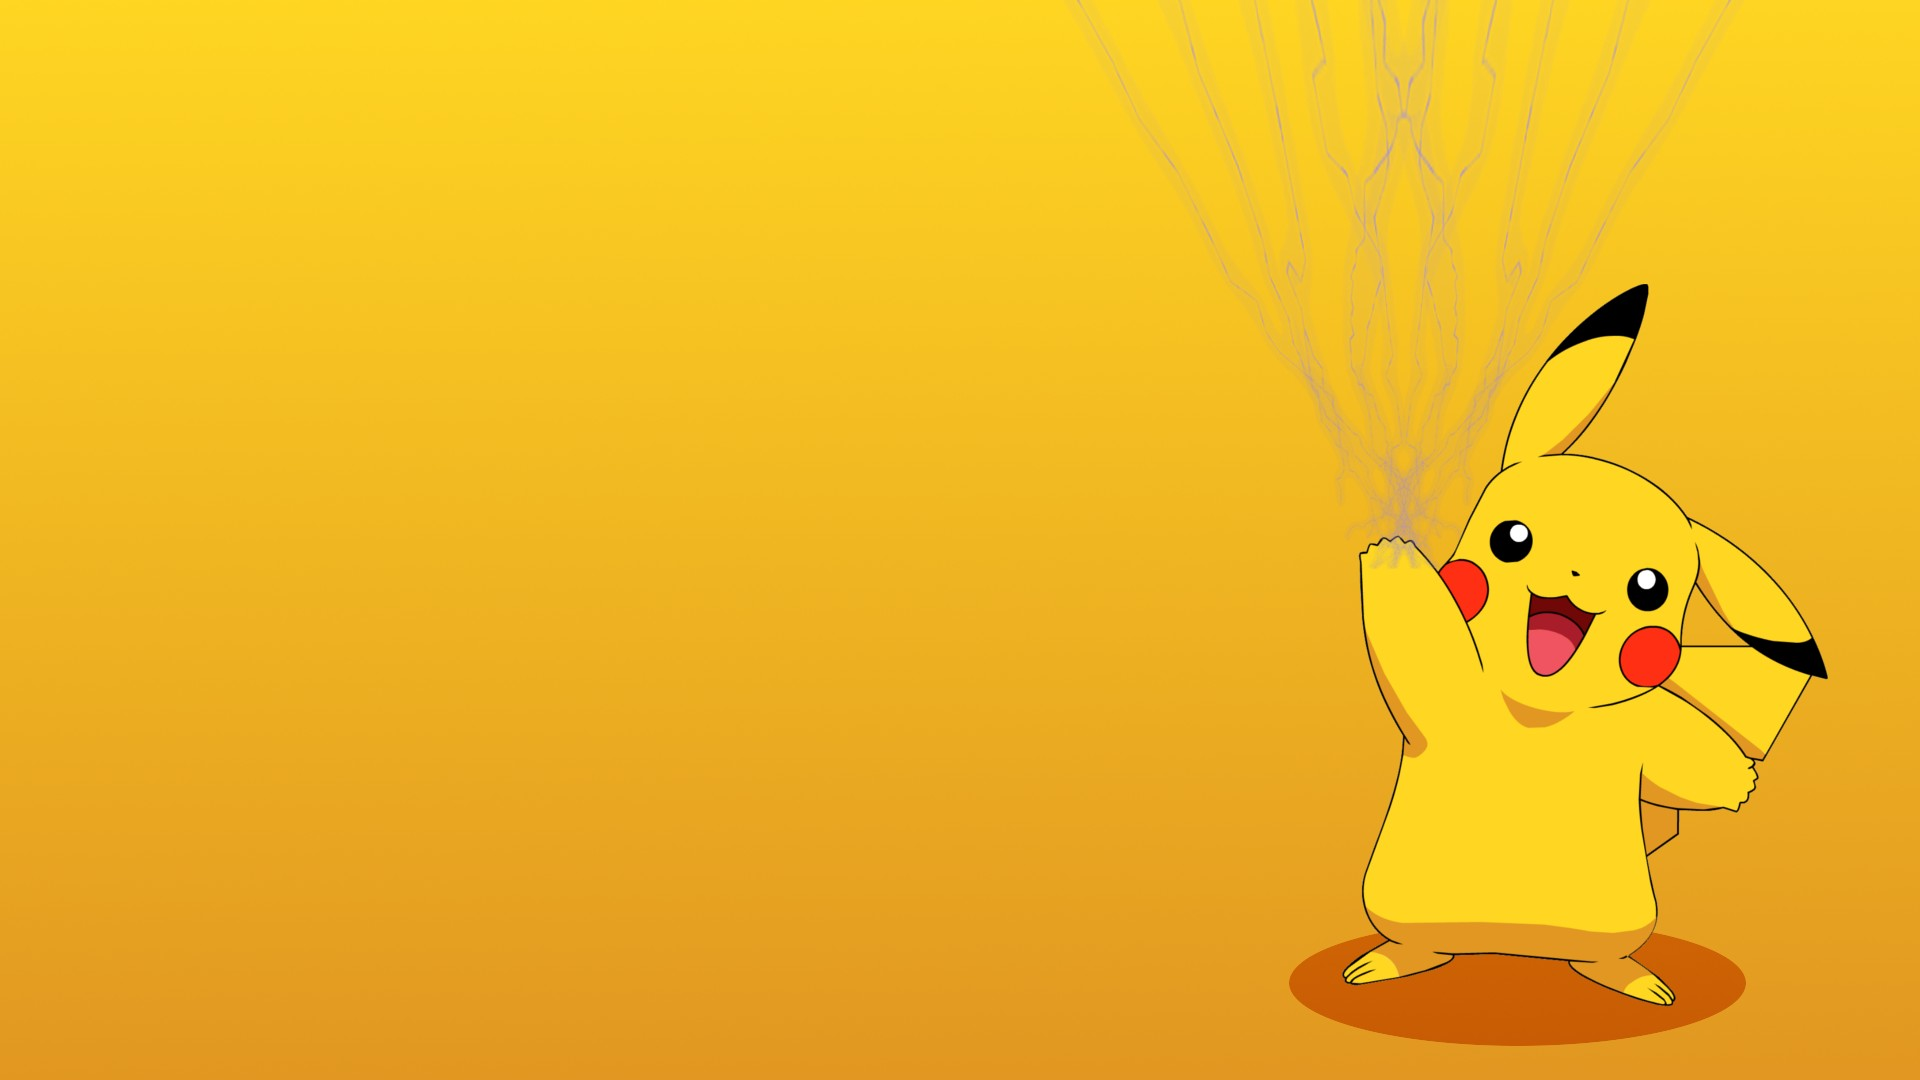 Pikachu background ·① Download free stunning full HD ...